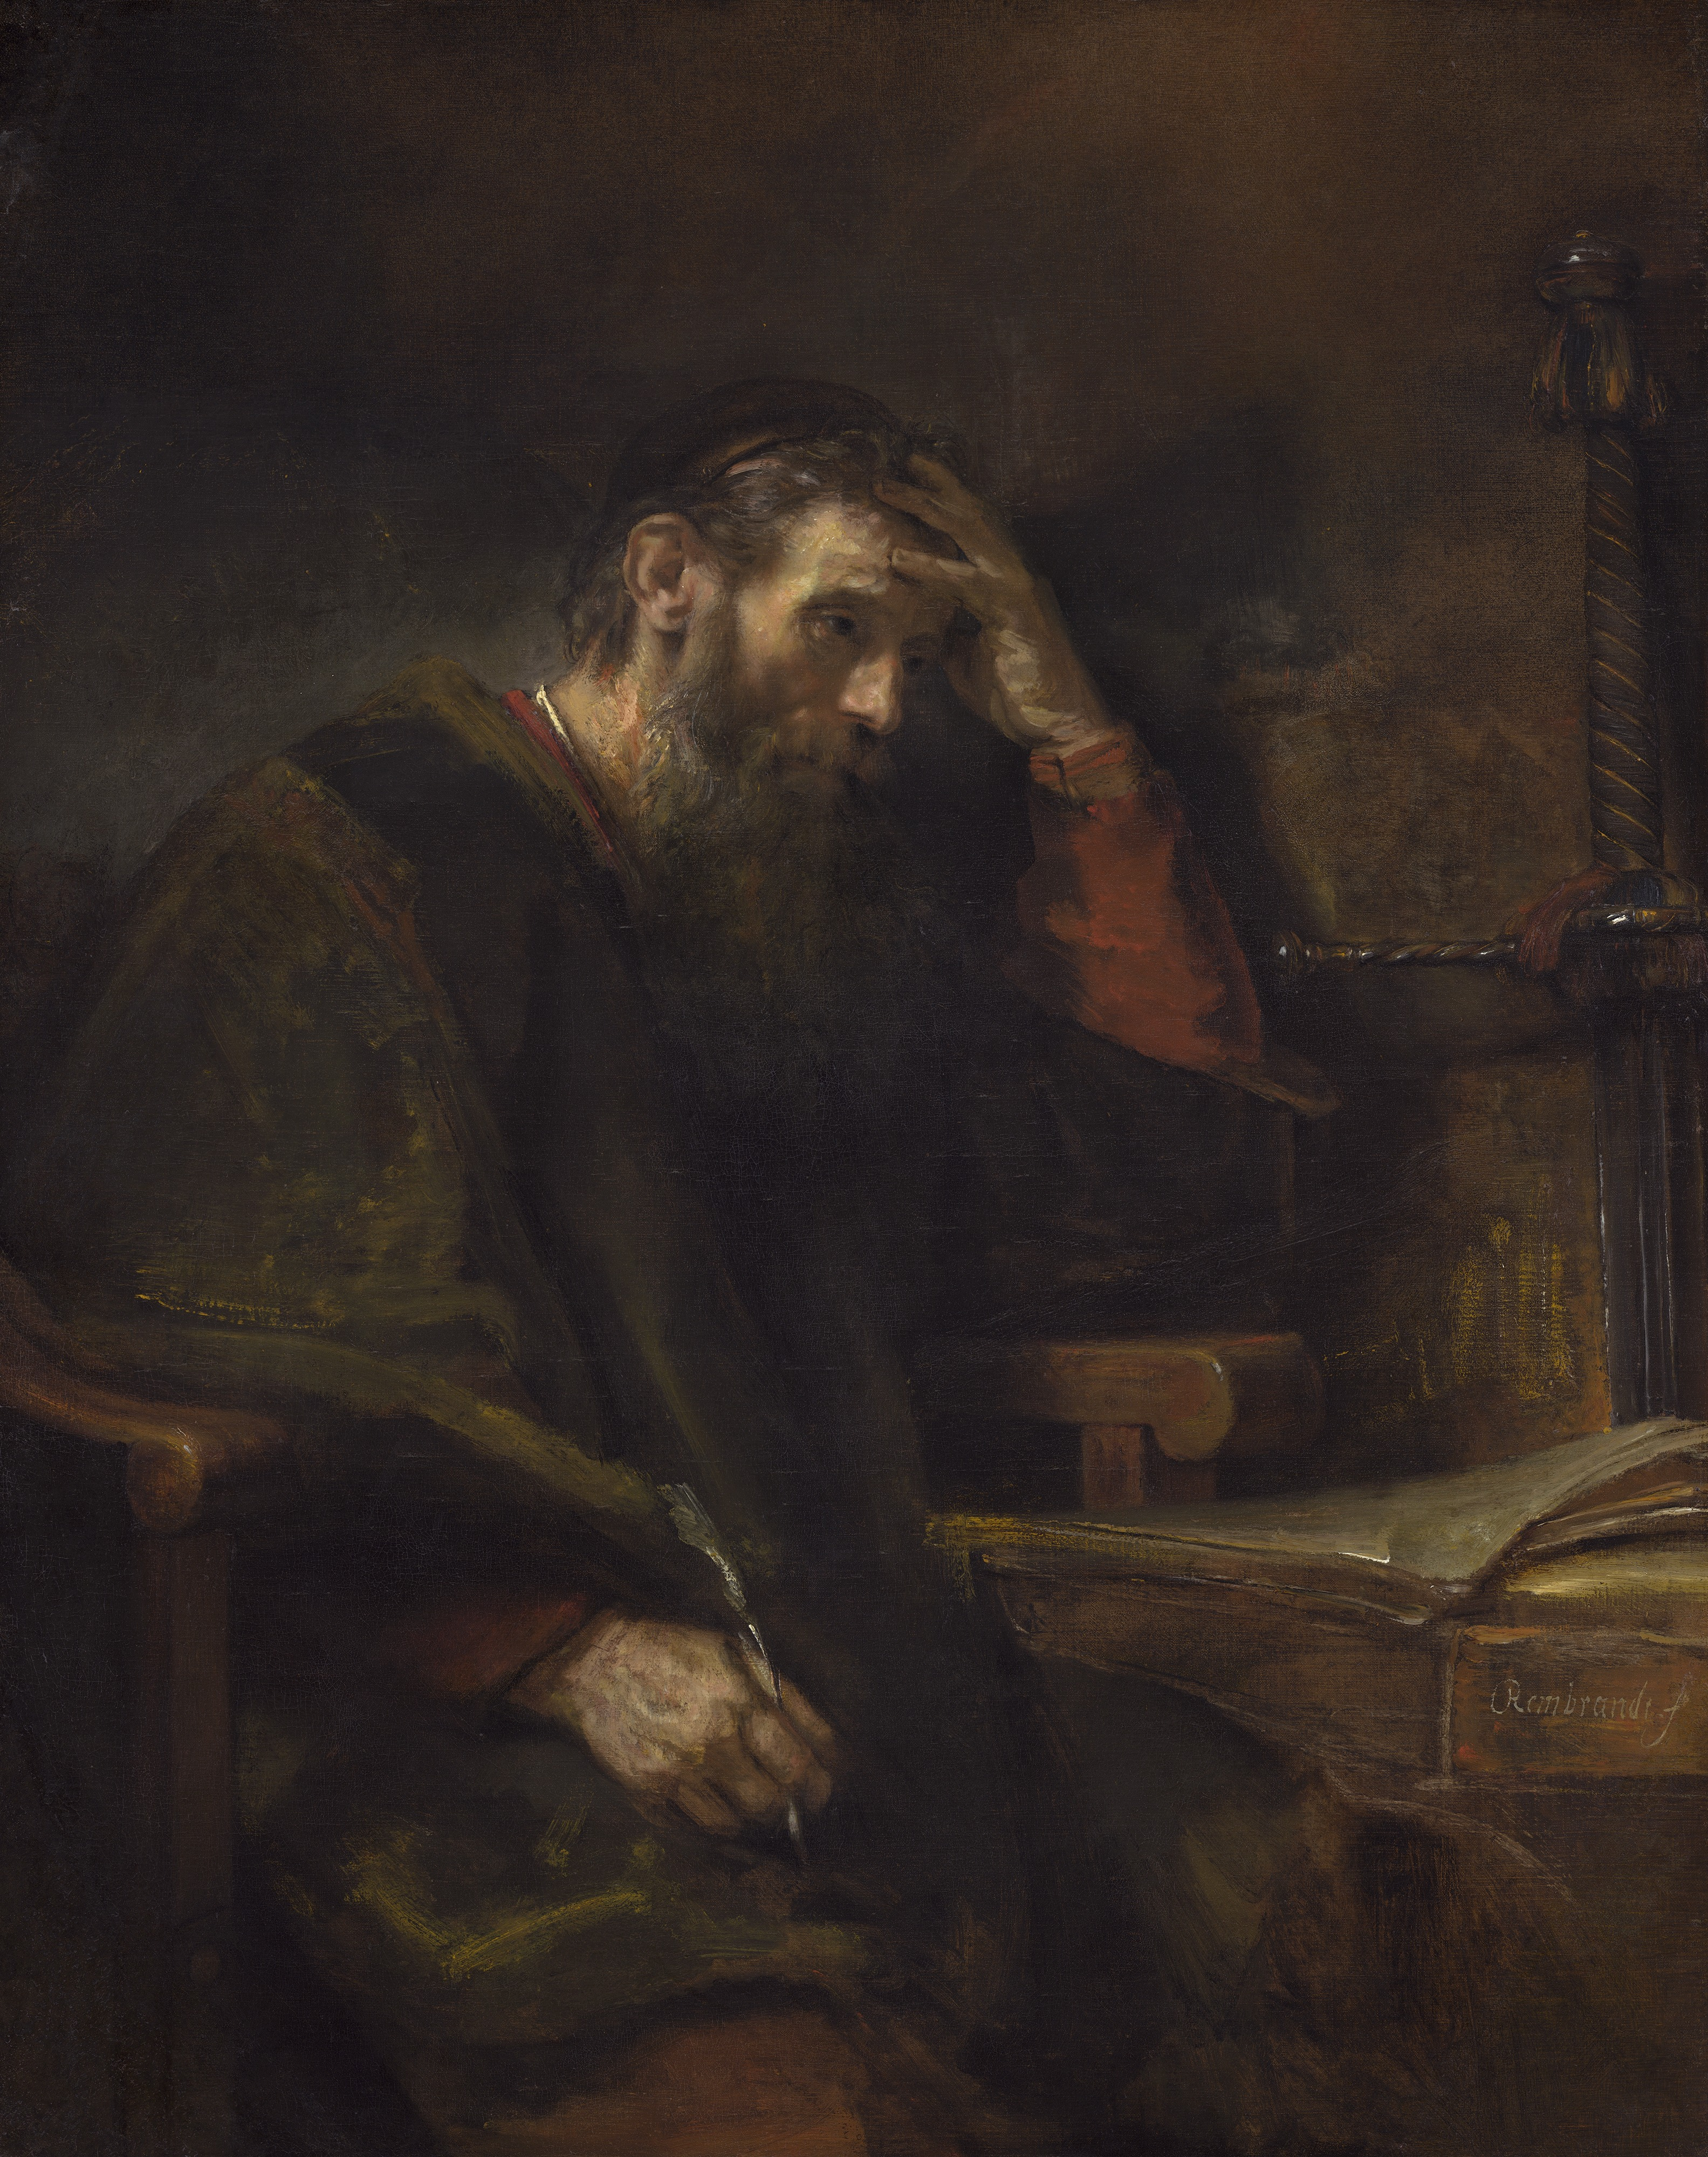 Saint_Paul,_Rembrandt_van_Rijn_(and_Workshop?),_c._1657.jpg (3167×4000)